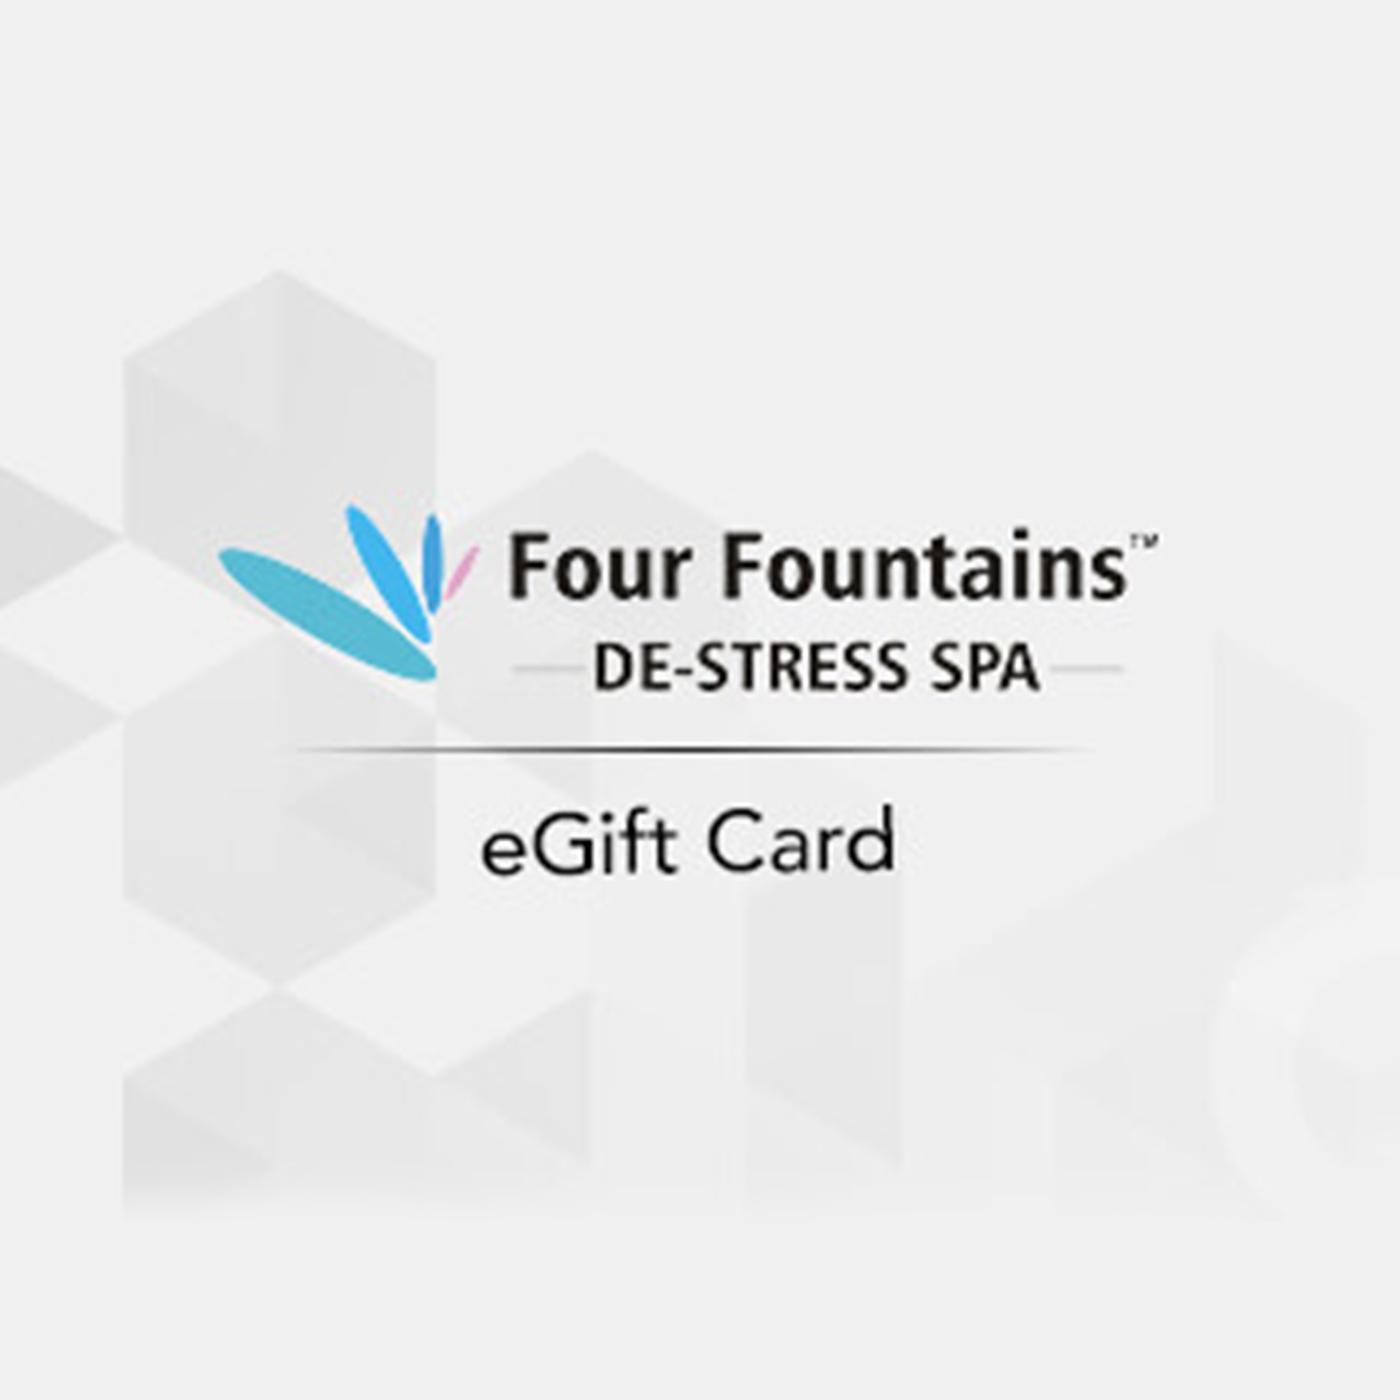 Four Fountains Spa E-Gift Card